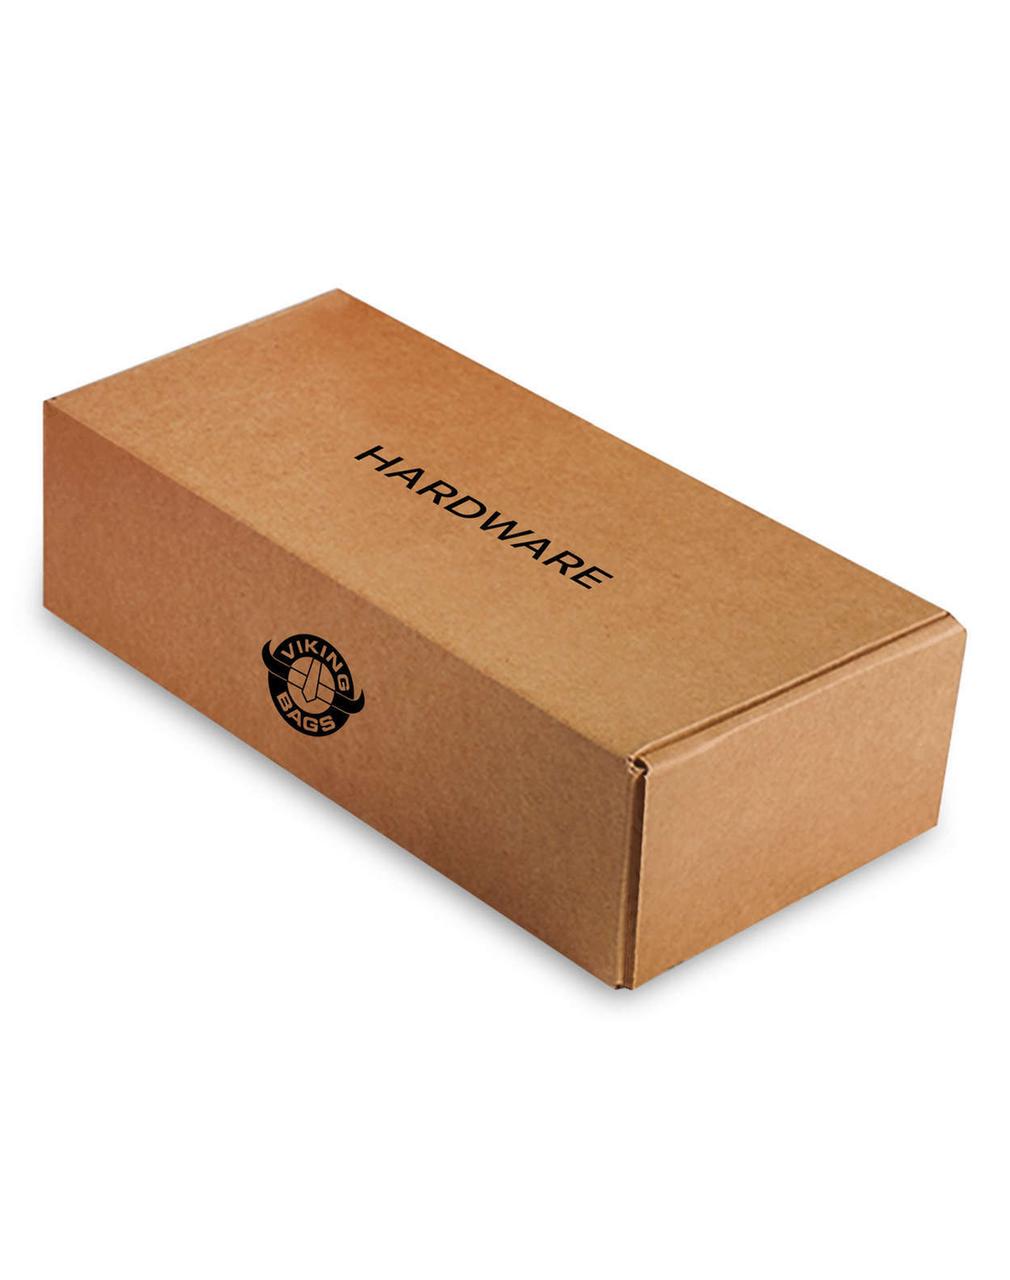 Honda 600 Shadow VLX SS Side Pocket Motorcycle Saddlebags box